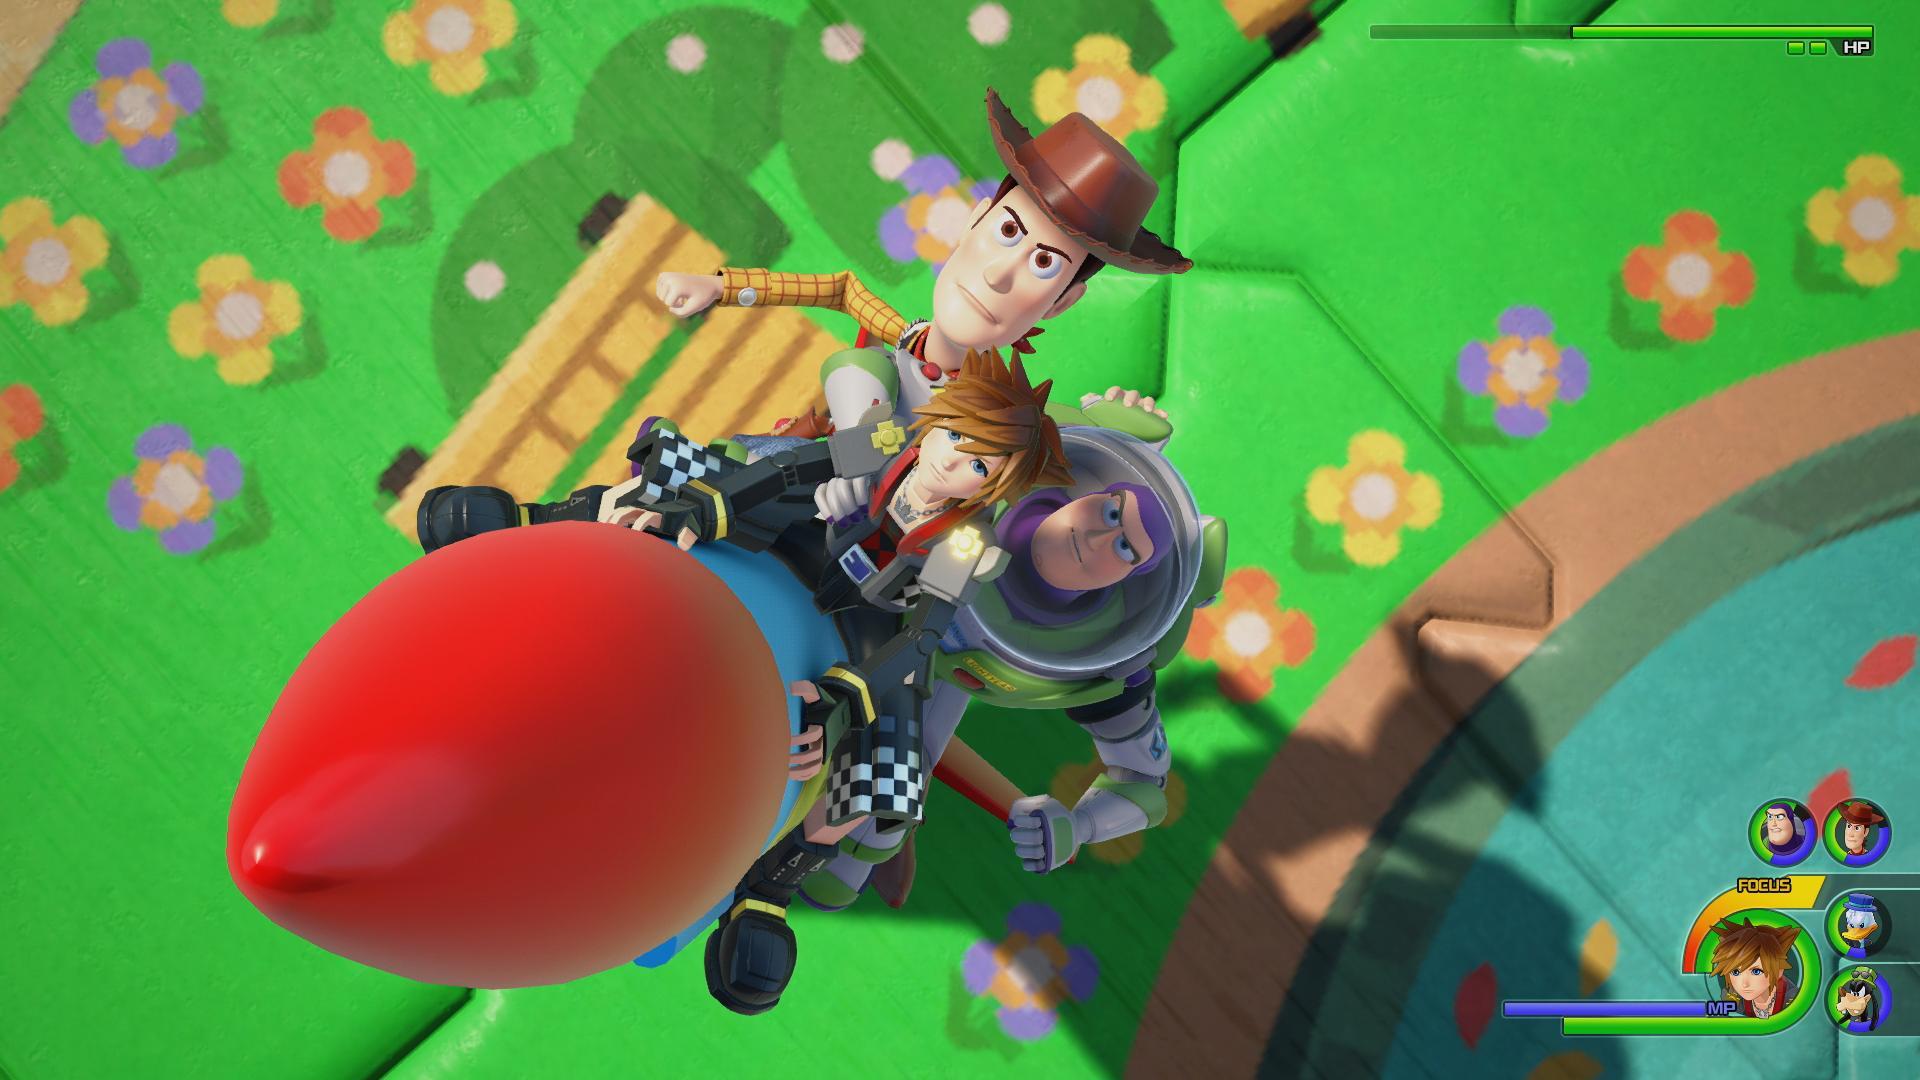 Kingdom Hearts III ultrapassa os 5 milhões de unidades vendidas